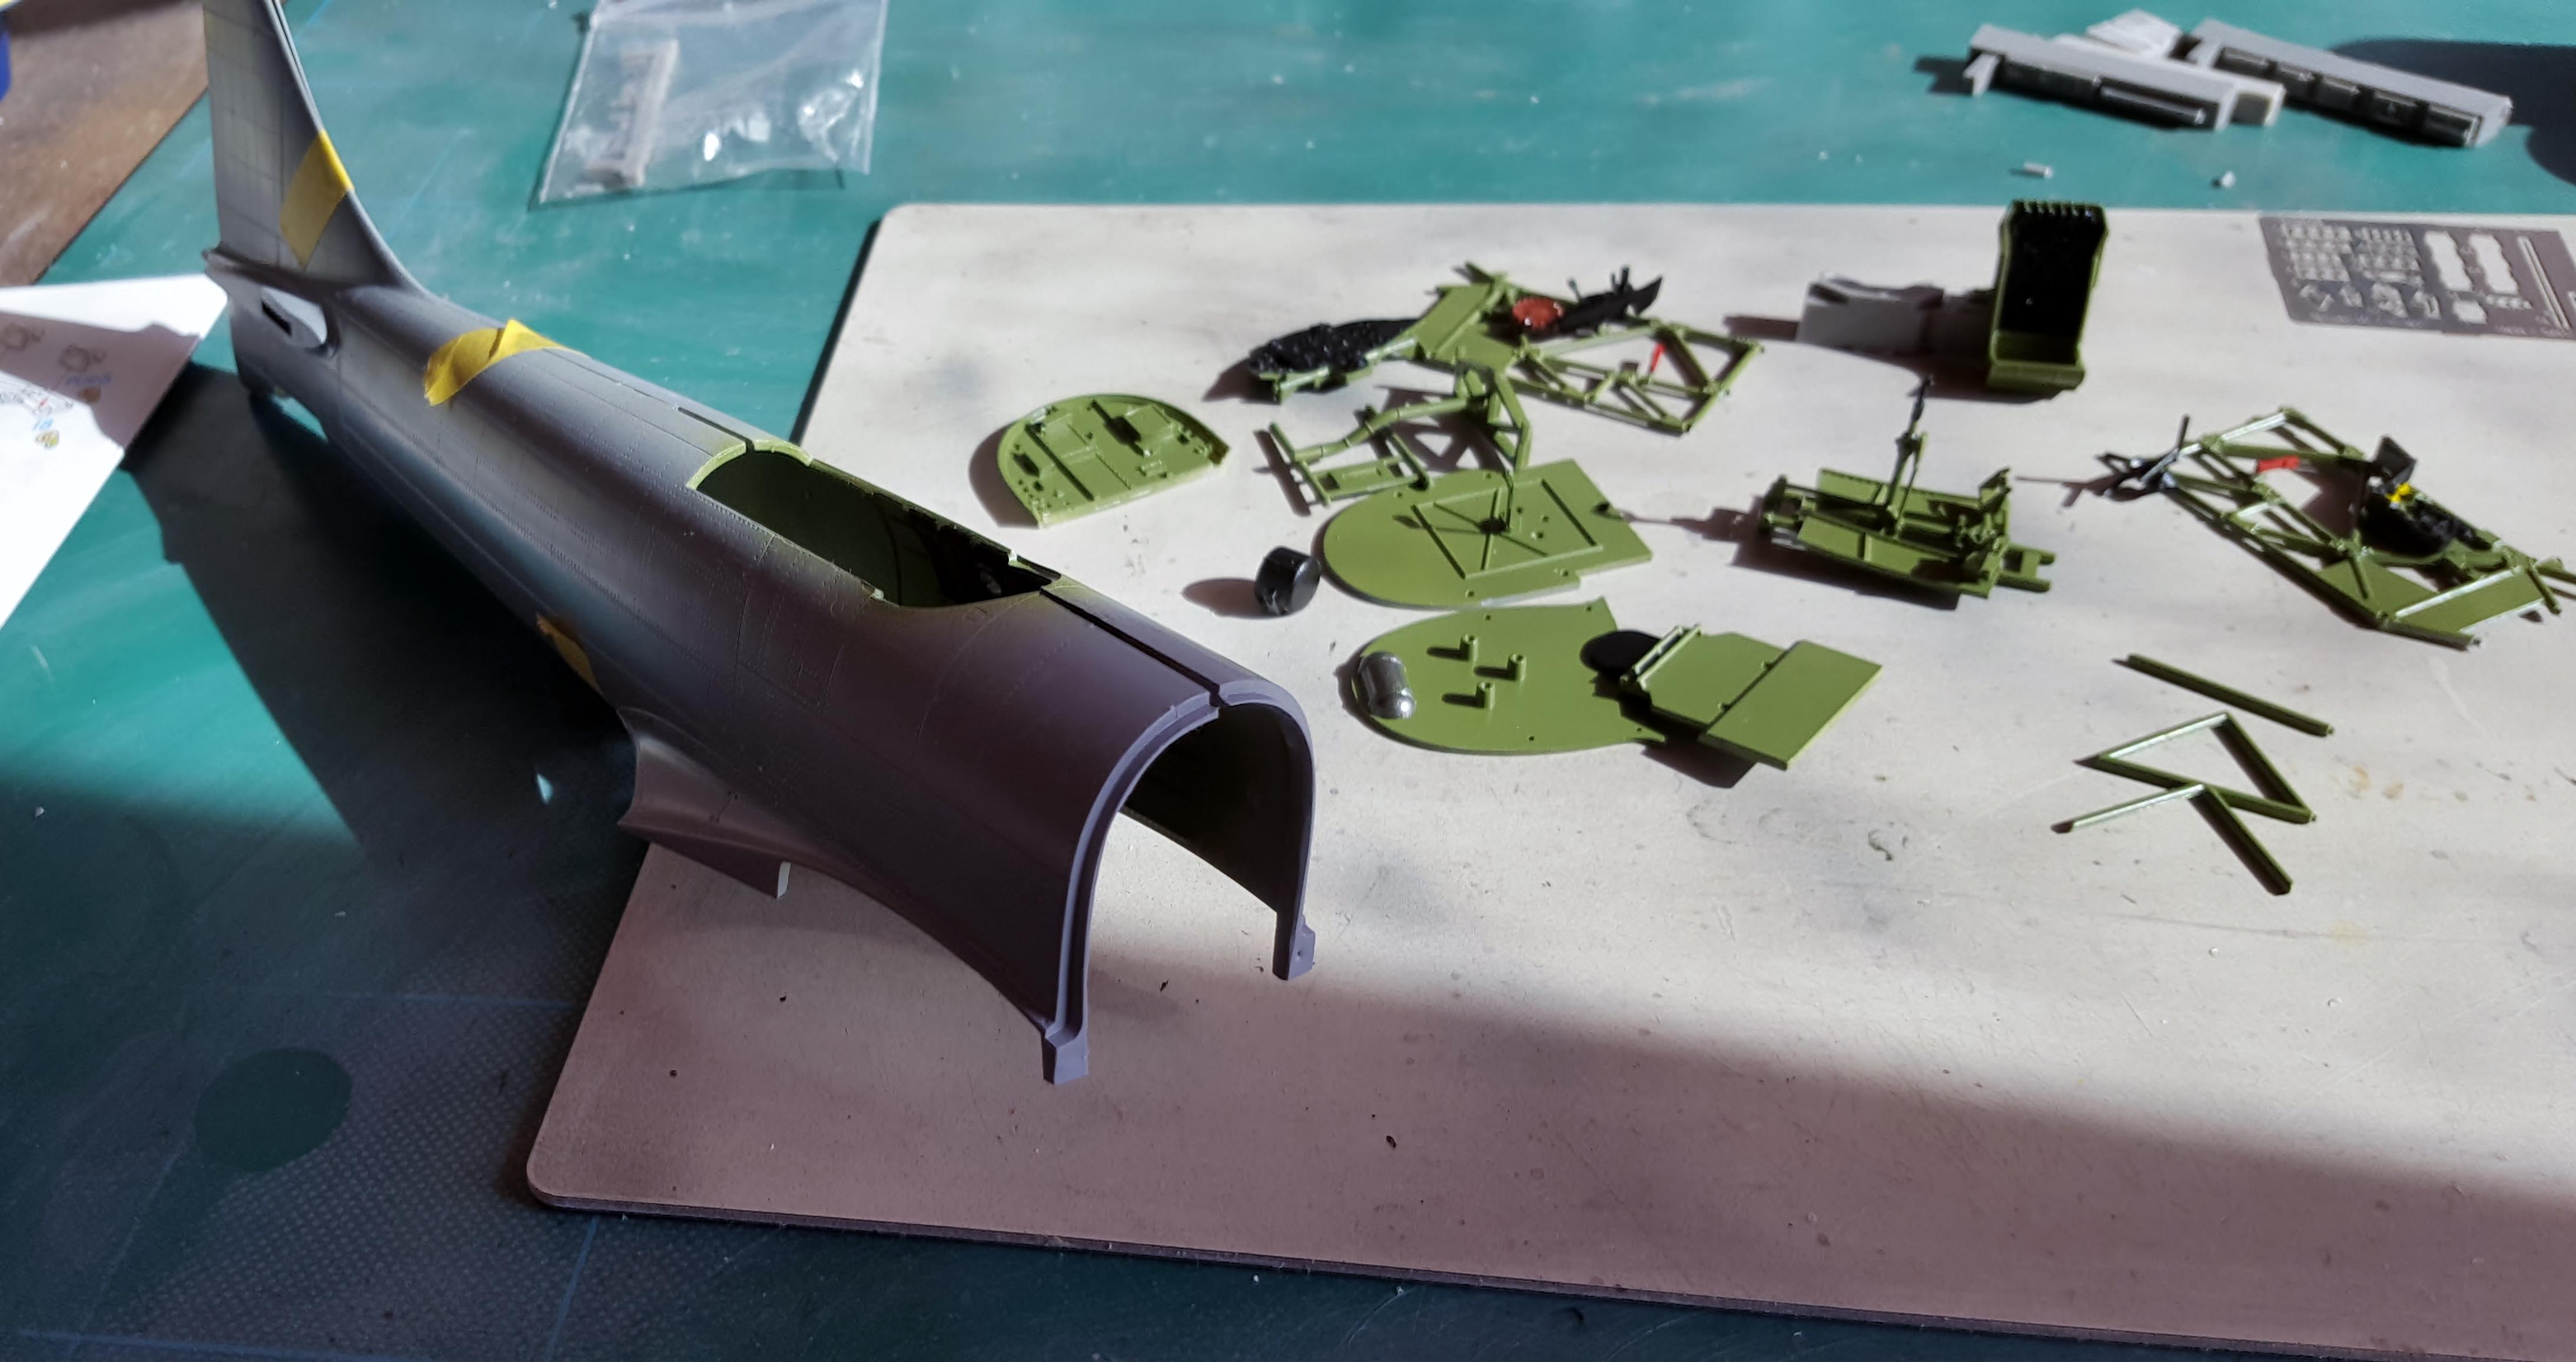 Hawker Tempest Special Hobby au 1/32ème 39436820170807173139